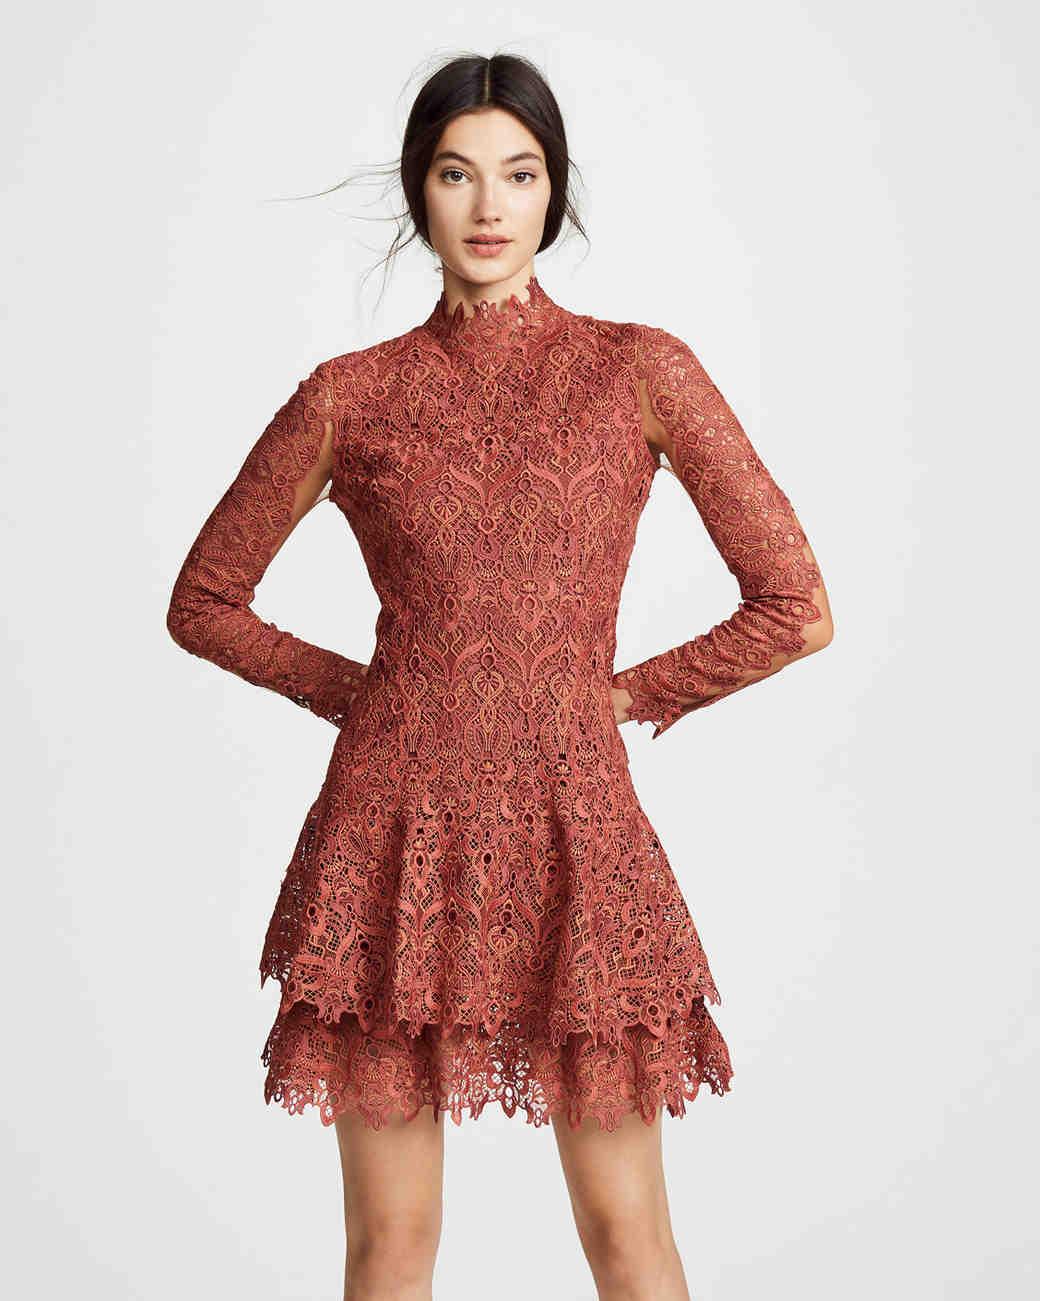 Rustic Fall Wedding Guest Dresses